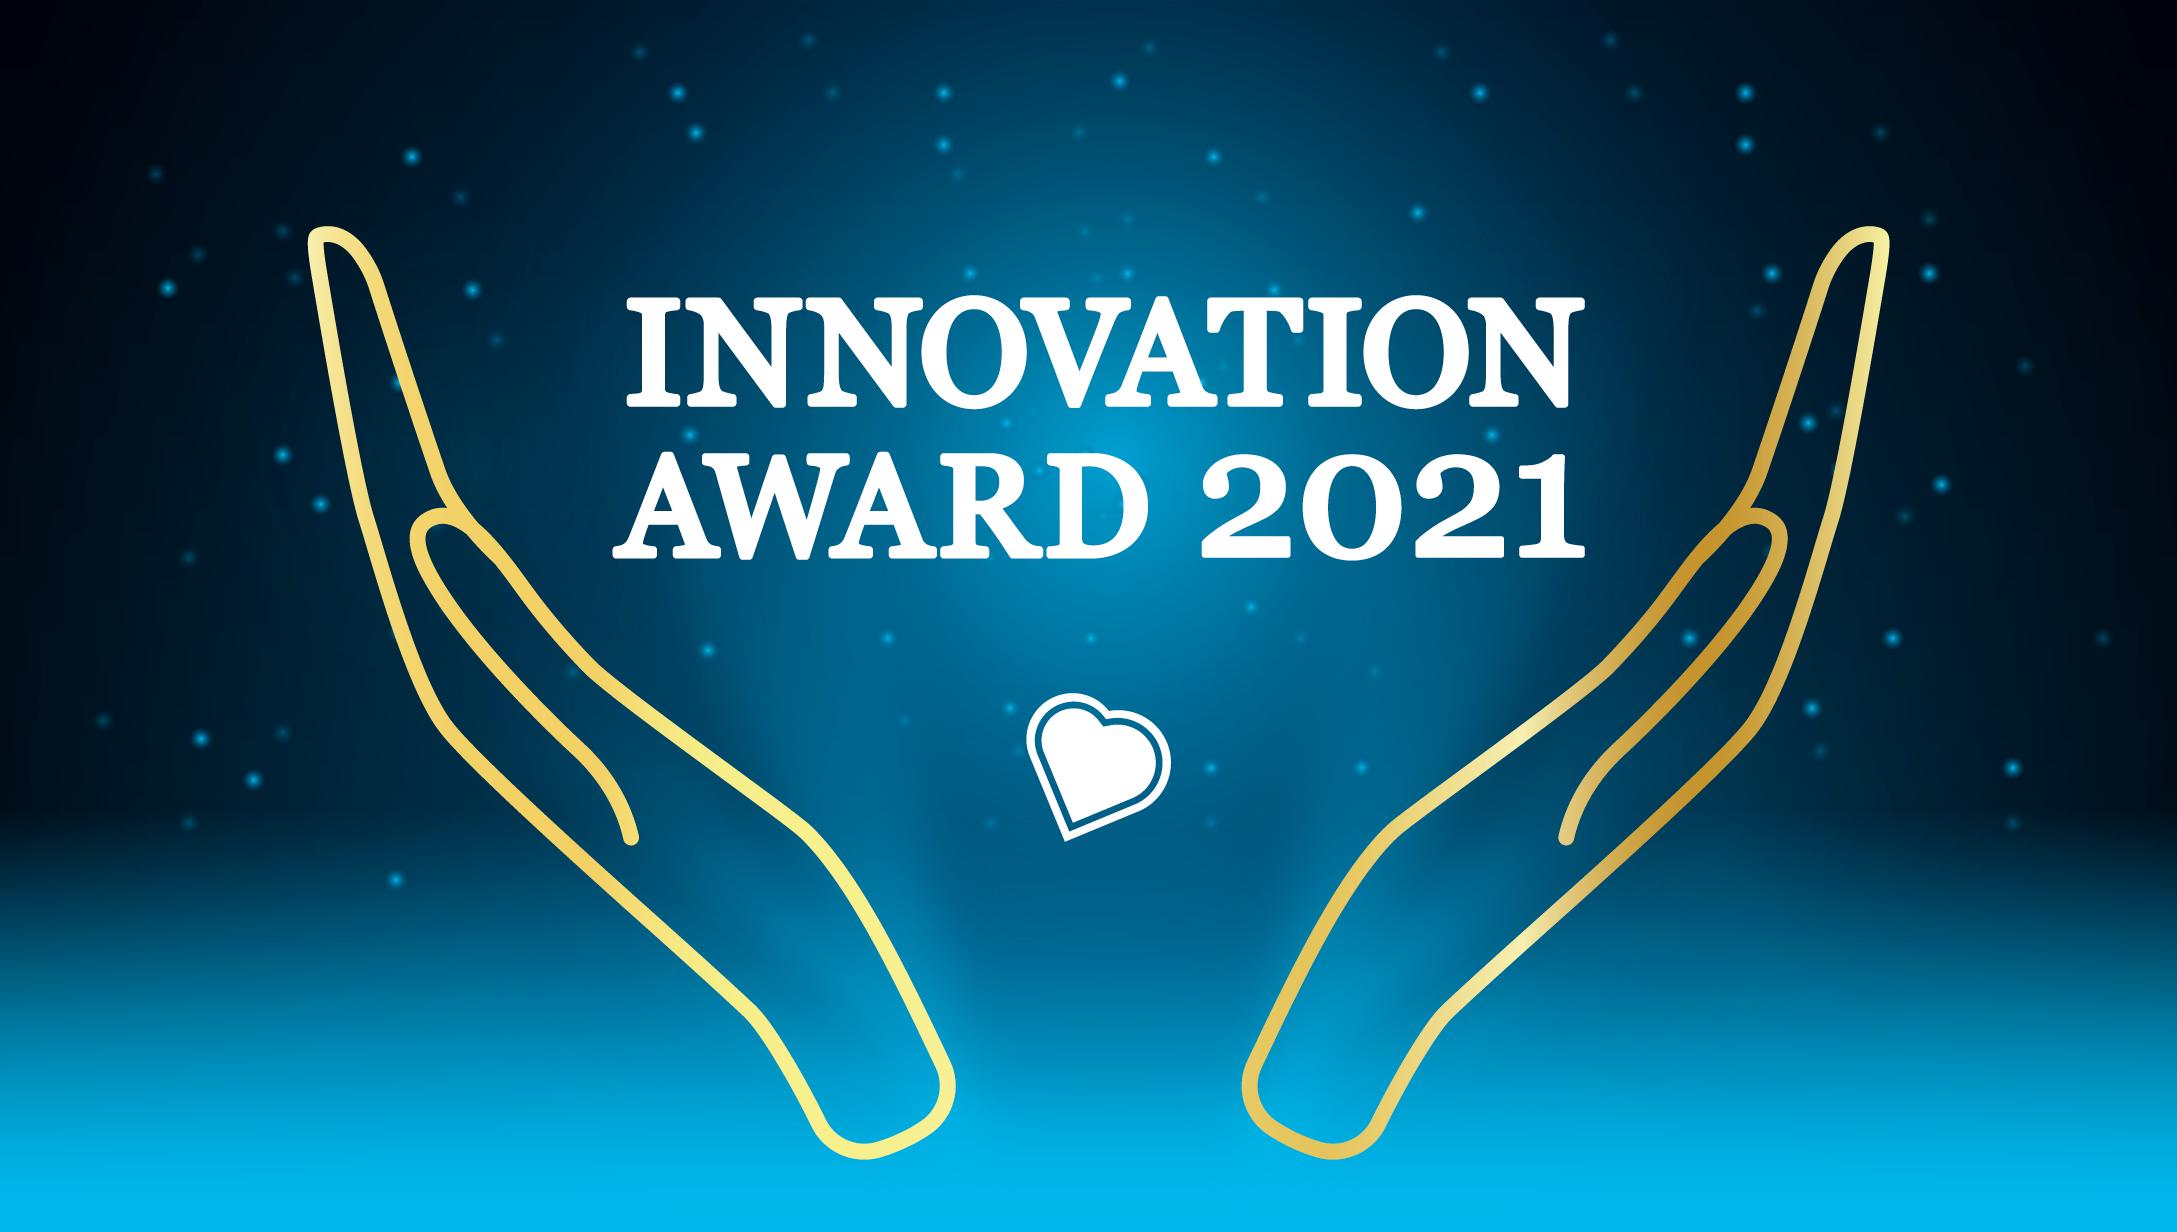 Logo for Innovation Award on starry background